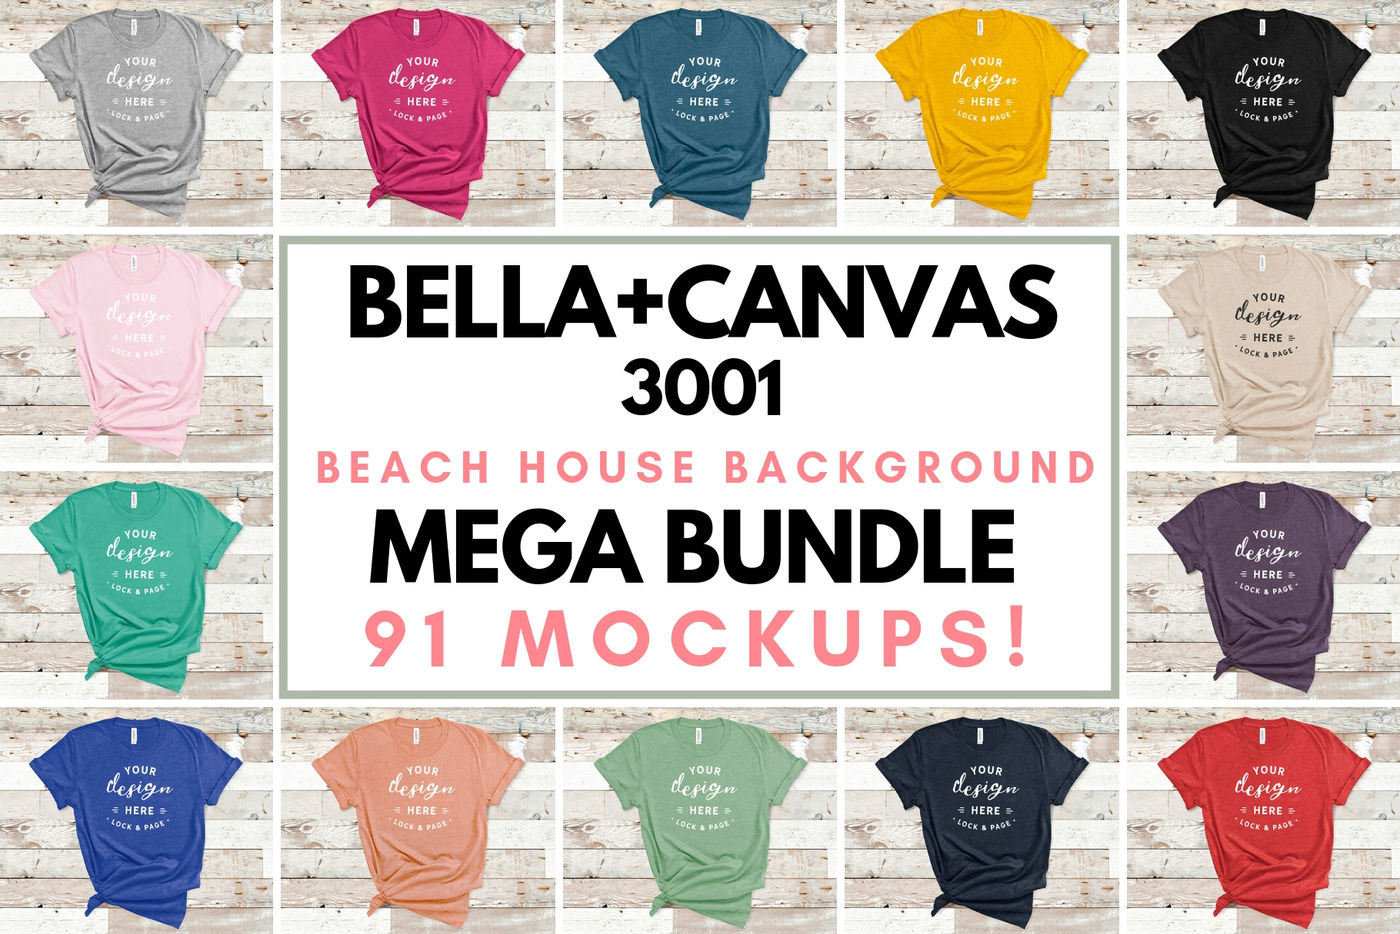 Bella Canvas Heather Clay Shirt Heather Clay Shirt Mockup Bella Canvas Tshirt Mockup Model Mockup Bella Canvas 3001 Mockup